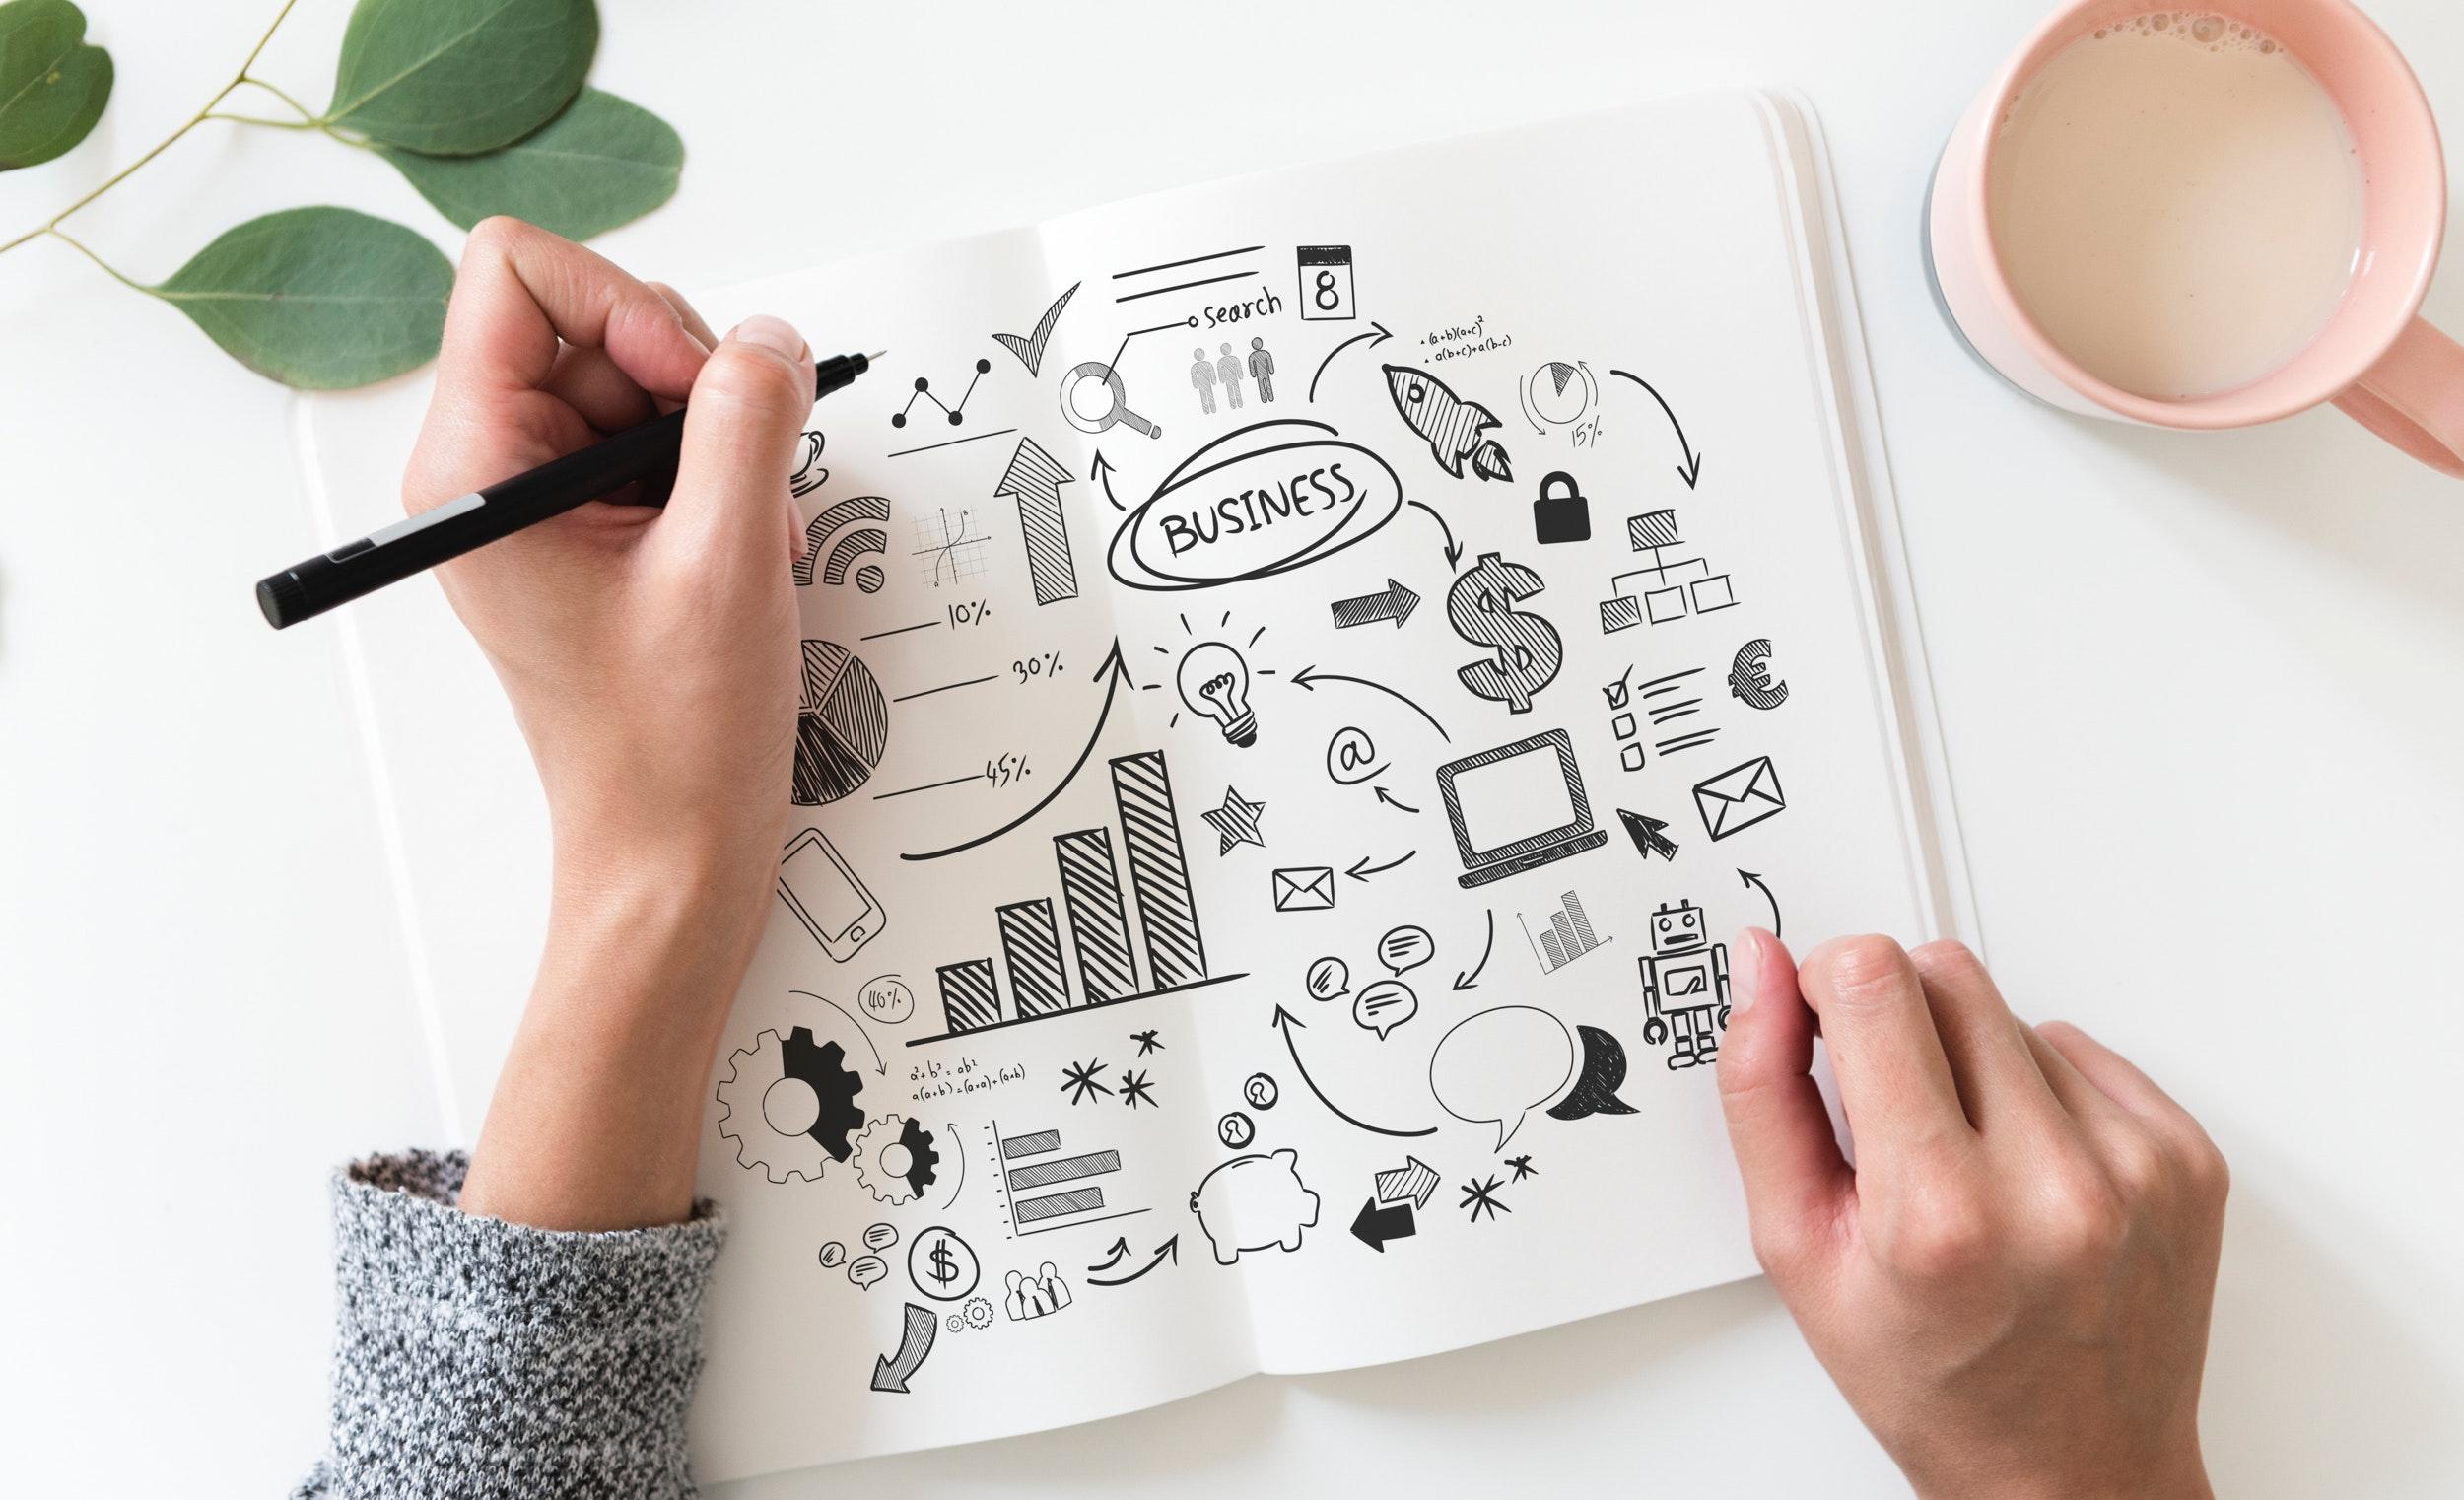 Brainstorming Business Plan